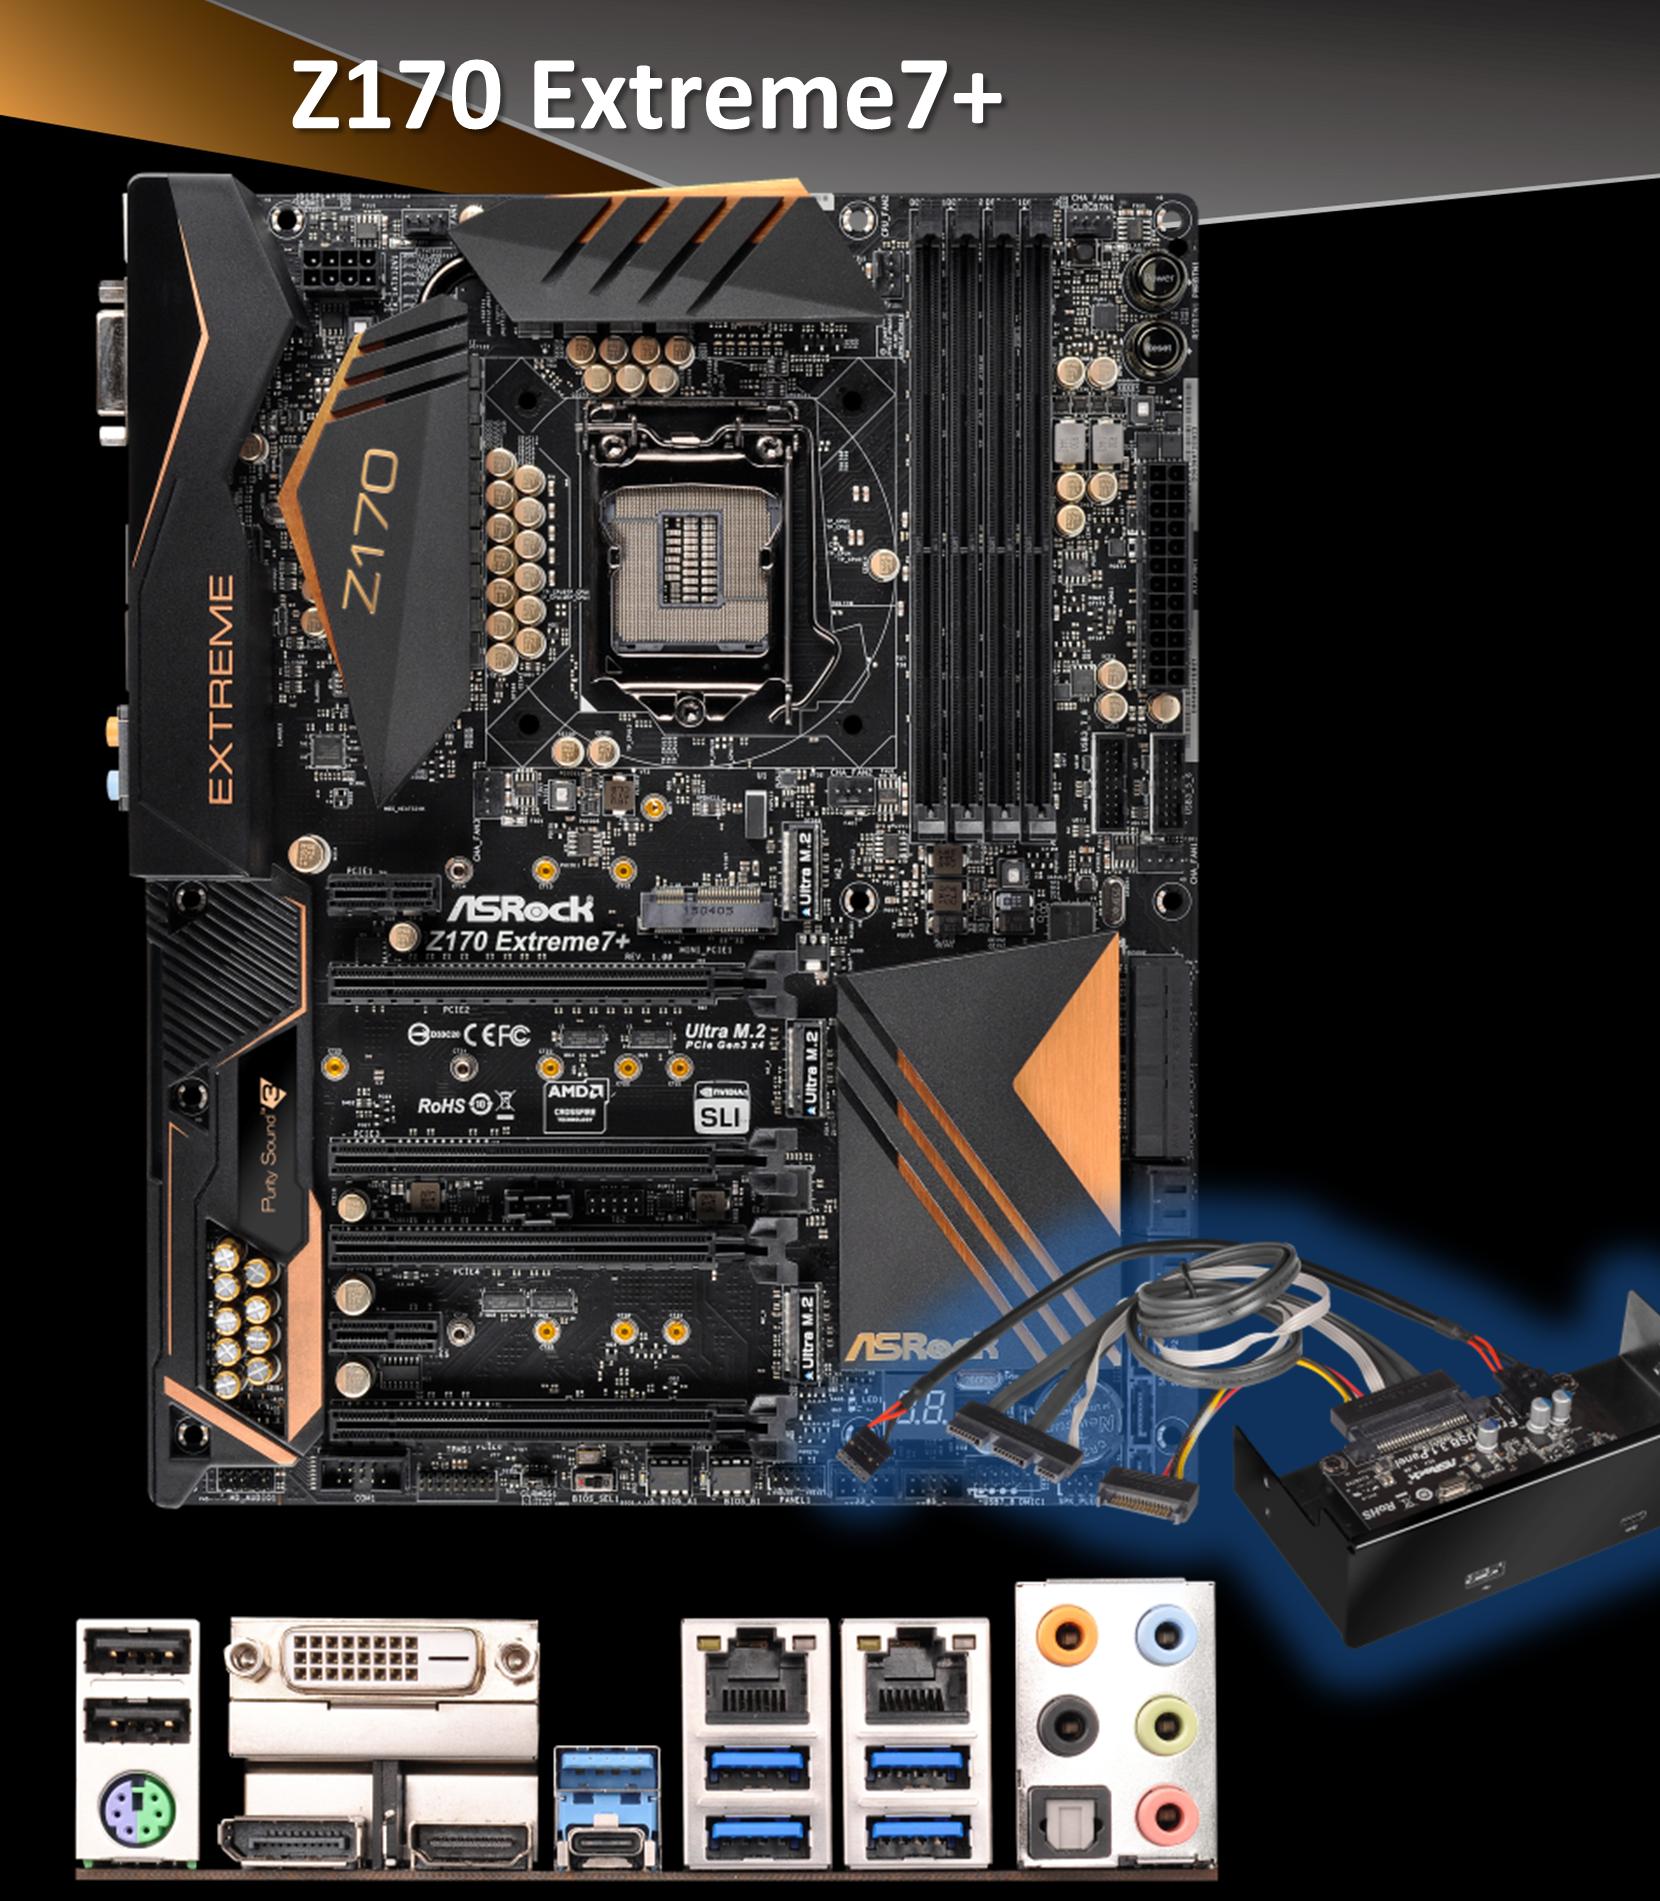 ASRock Z170 Extreme6+ Realtek Audio Drivers